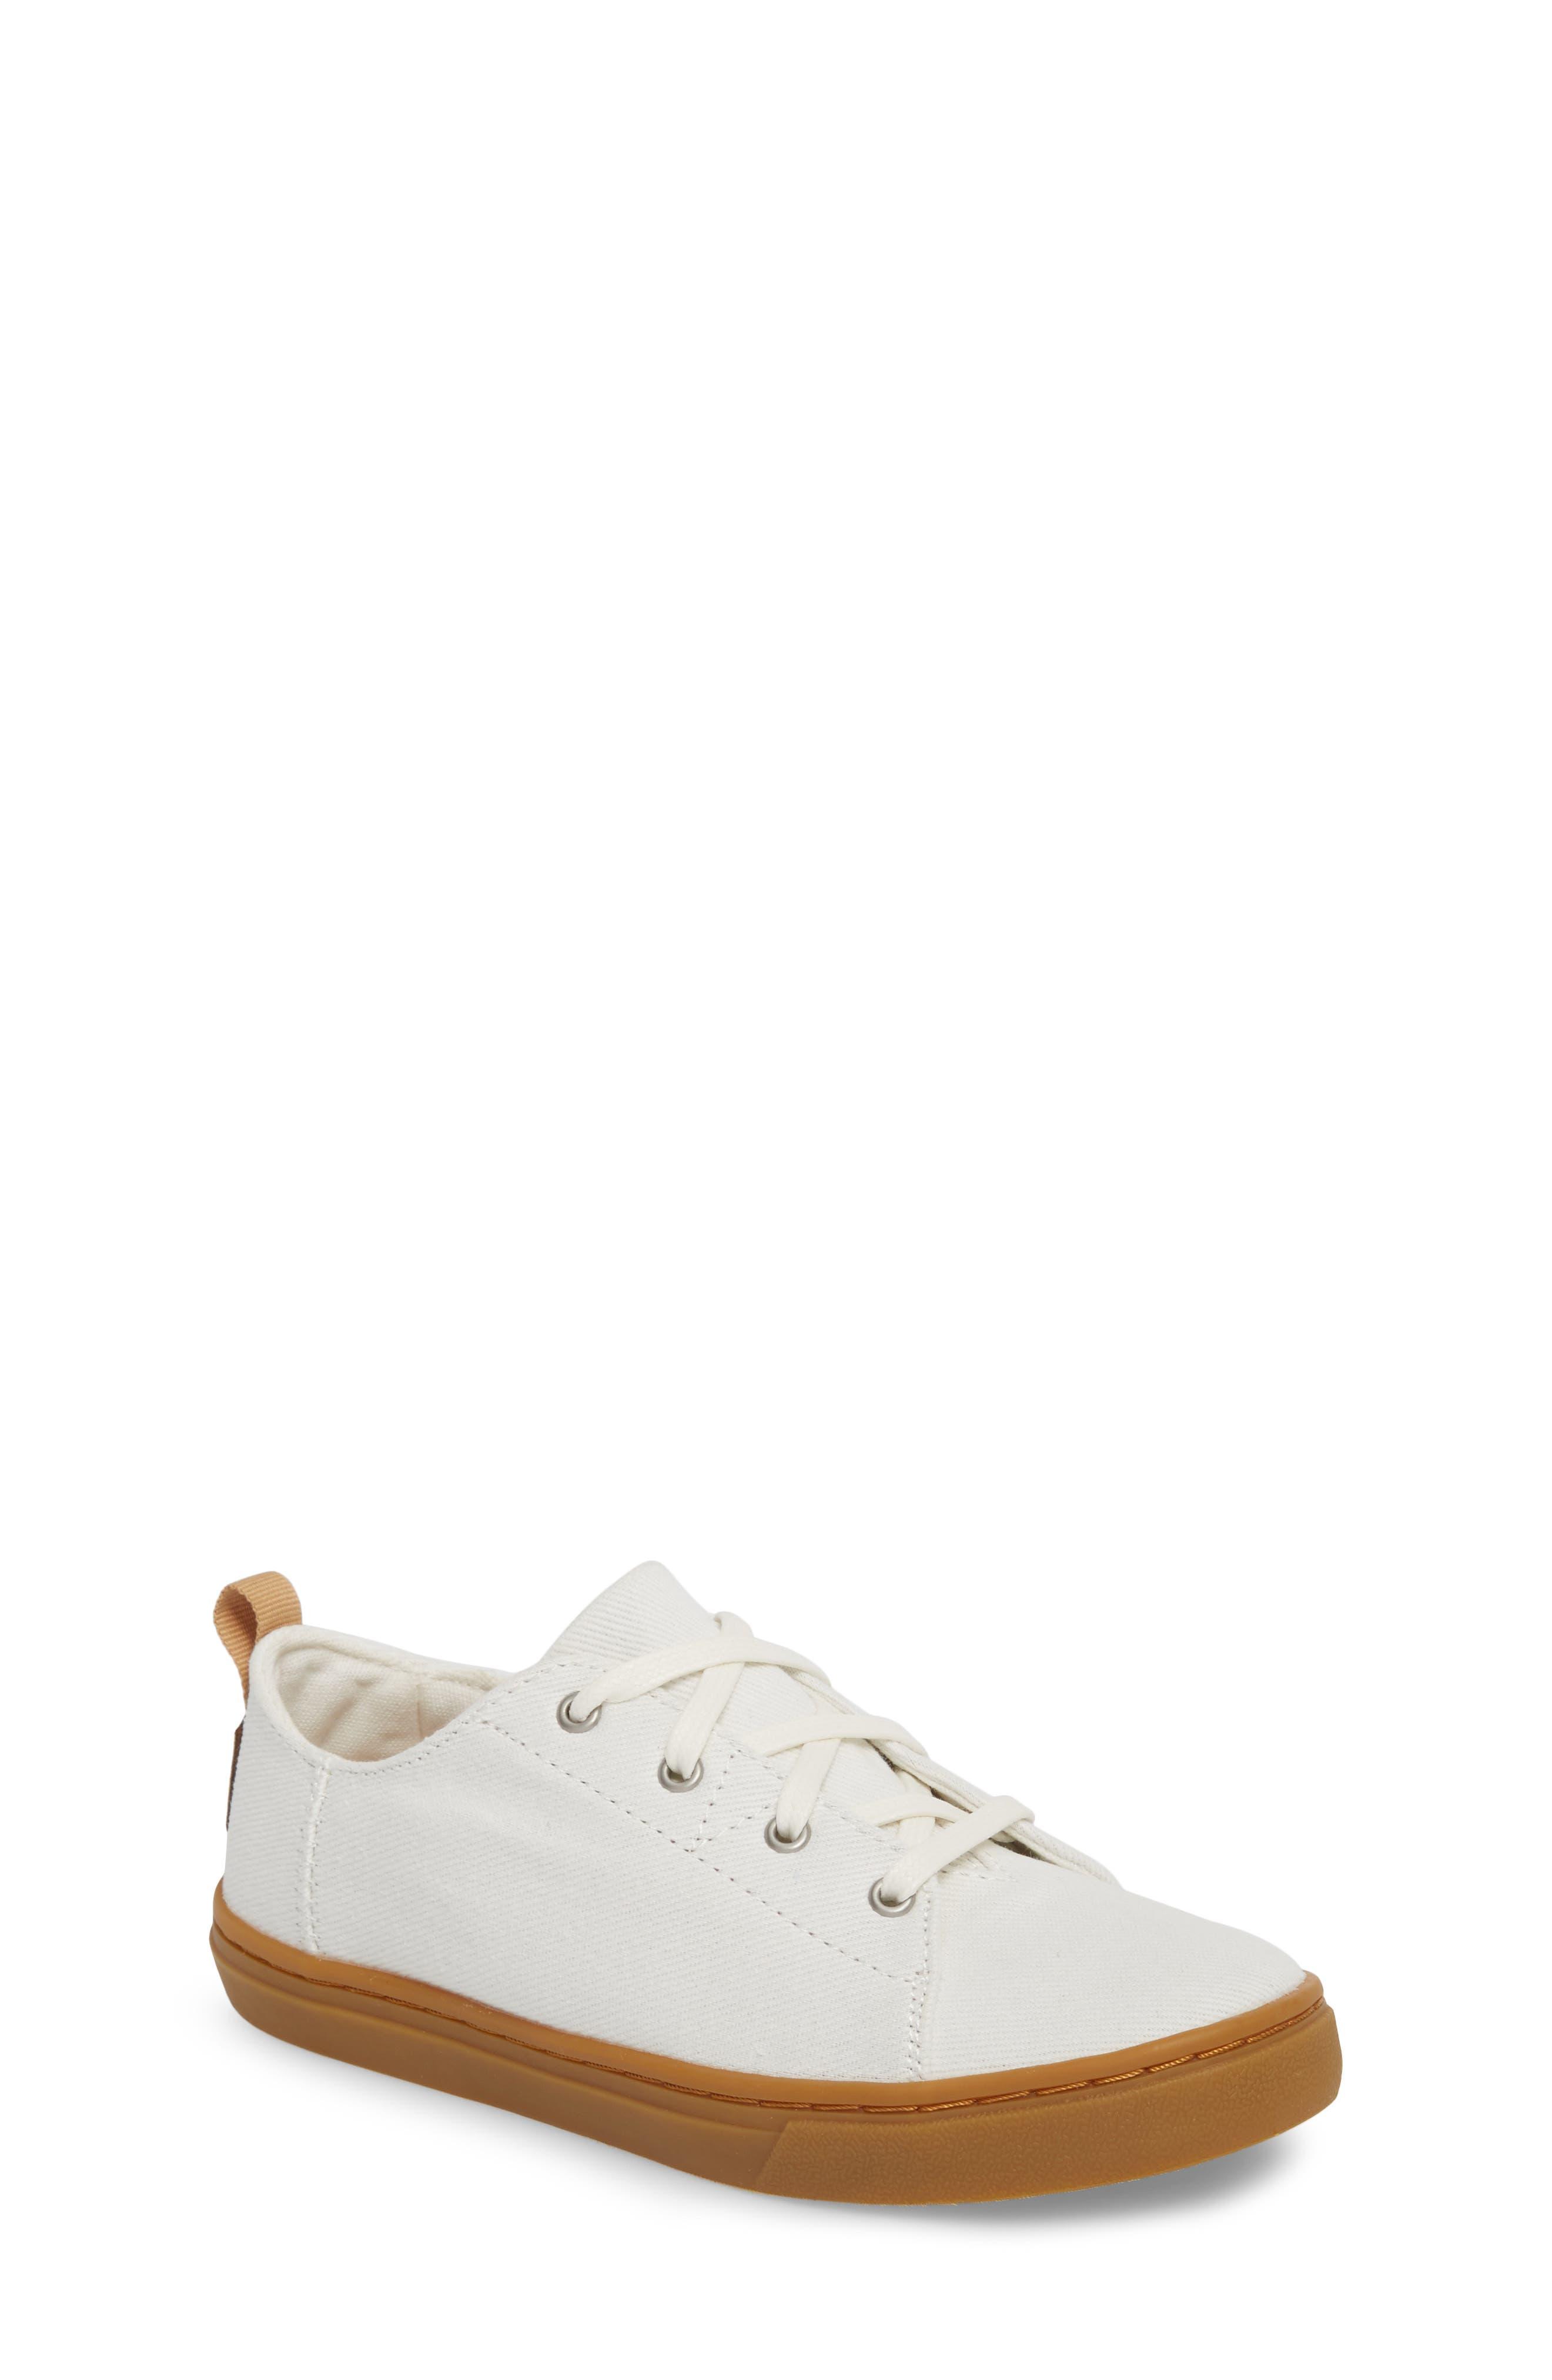 TOMS Lenny Sneaker (Toddler, Little Kid & Big Kid)